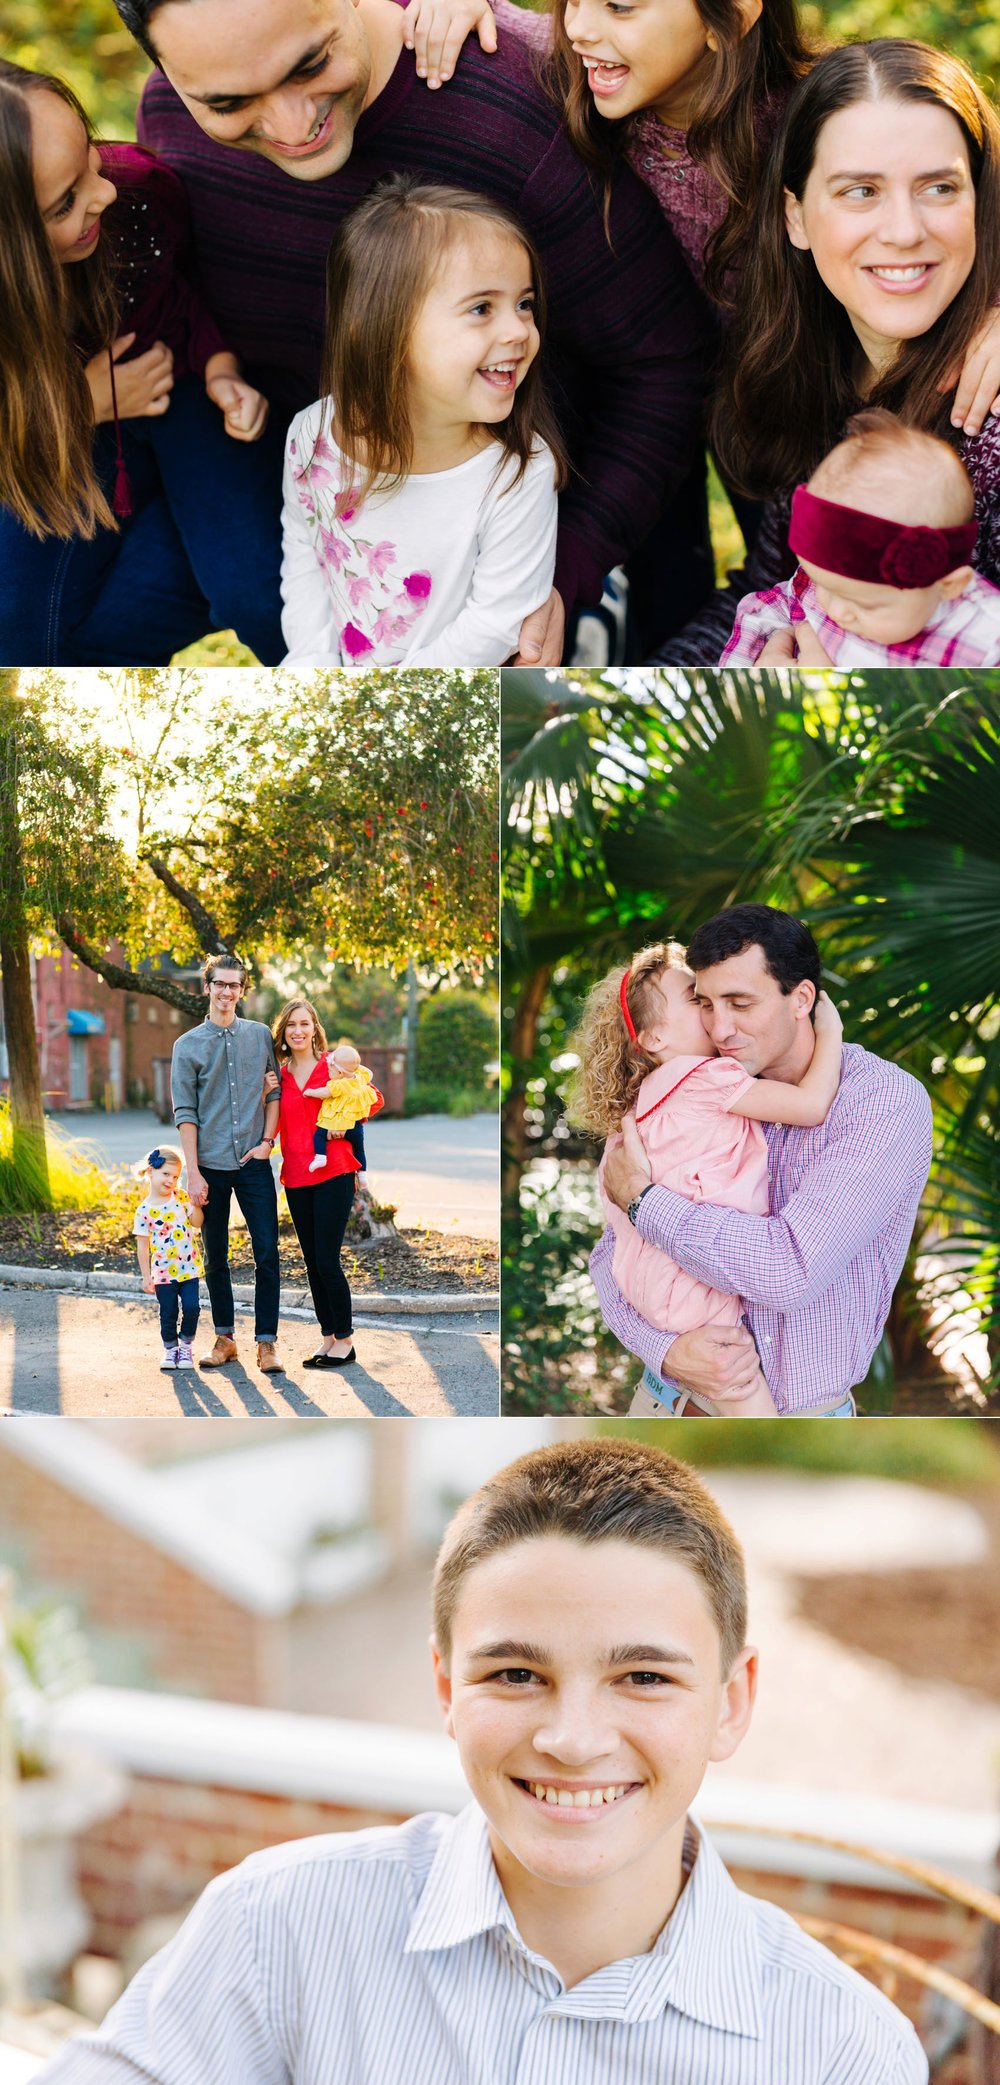 Jake & Katie's Best of Families 2016-016.jpg